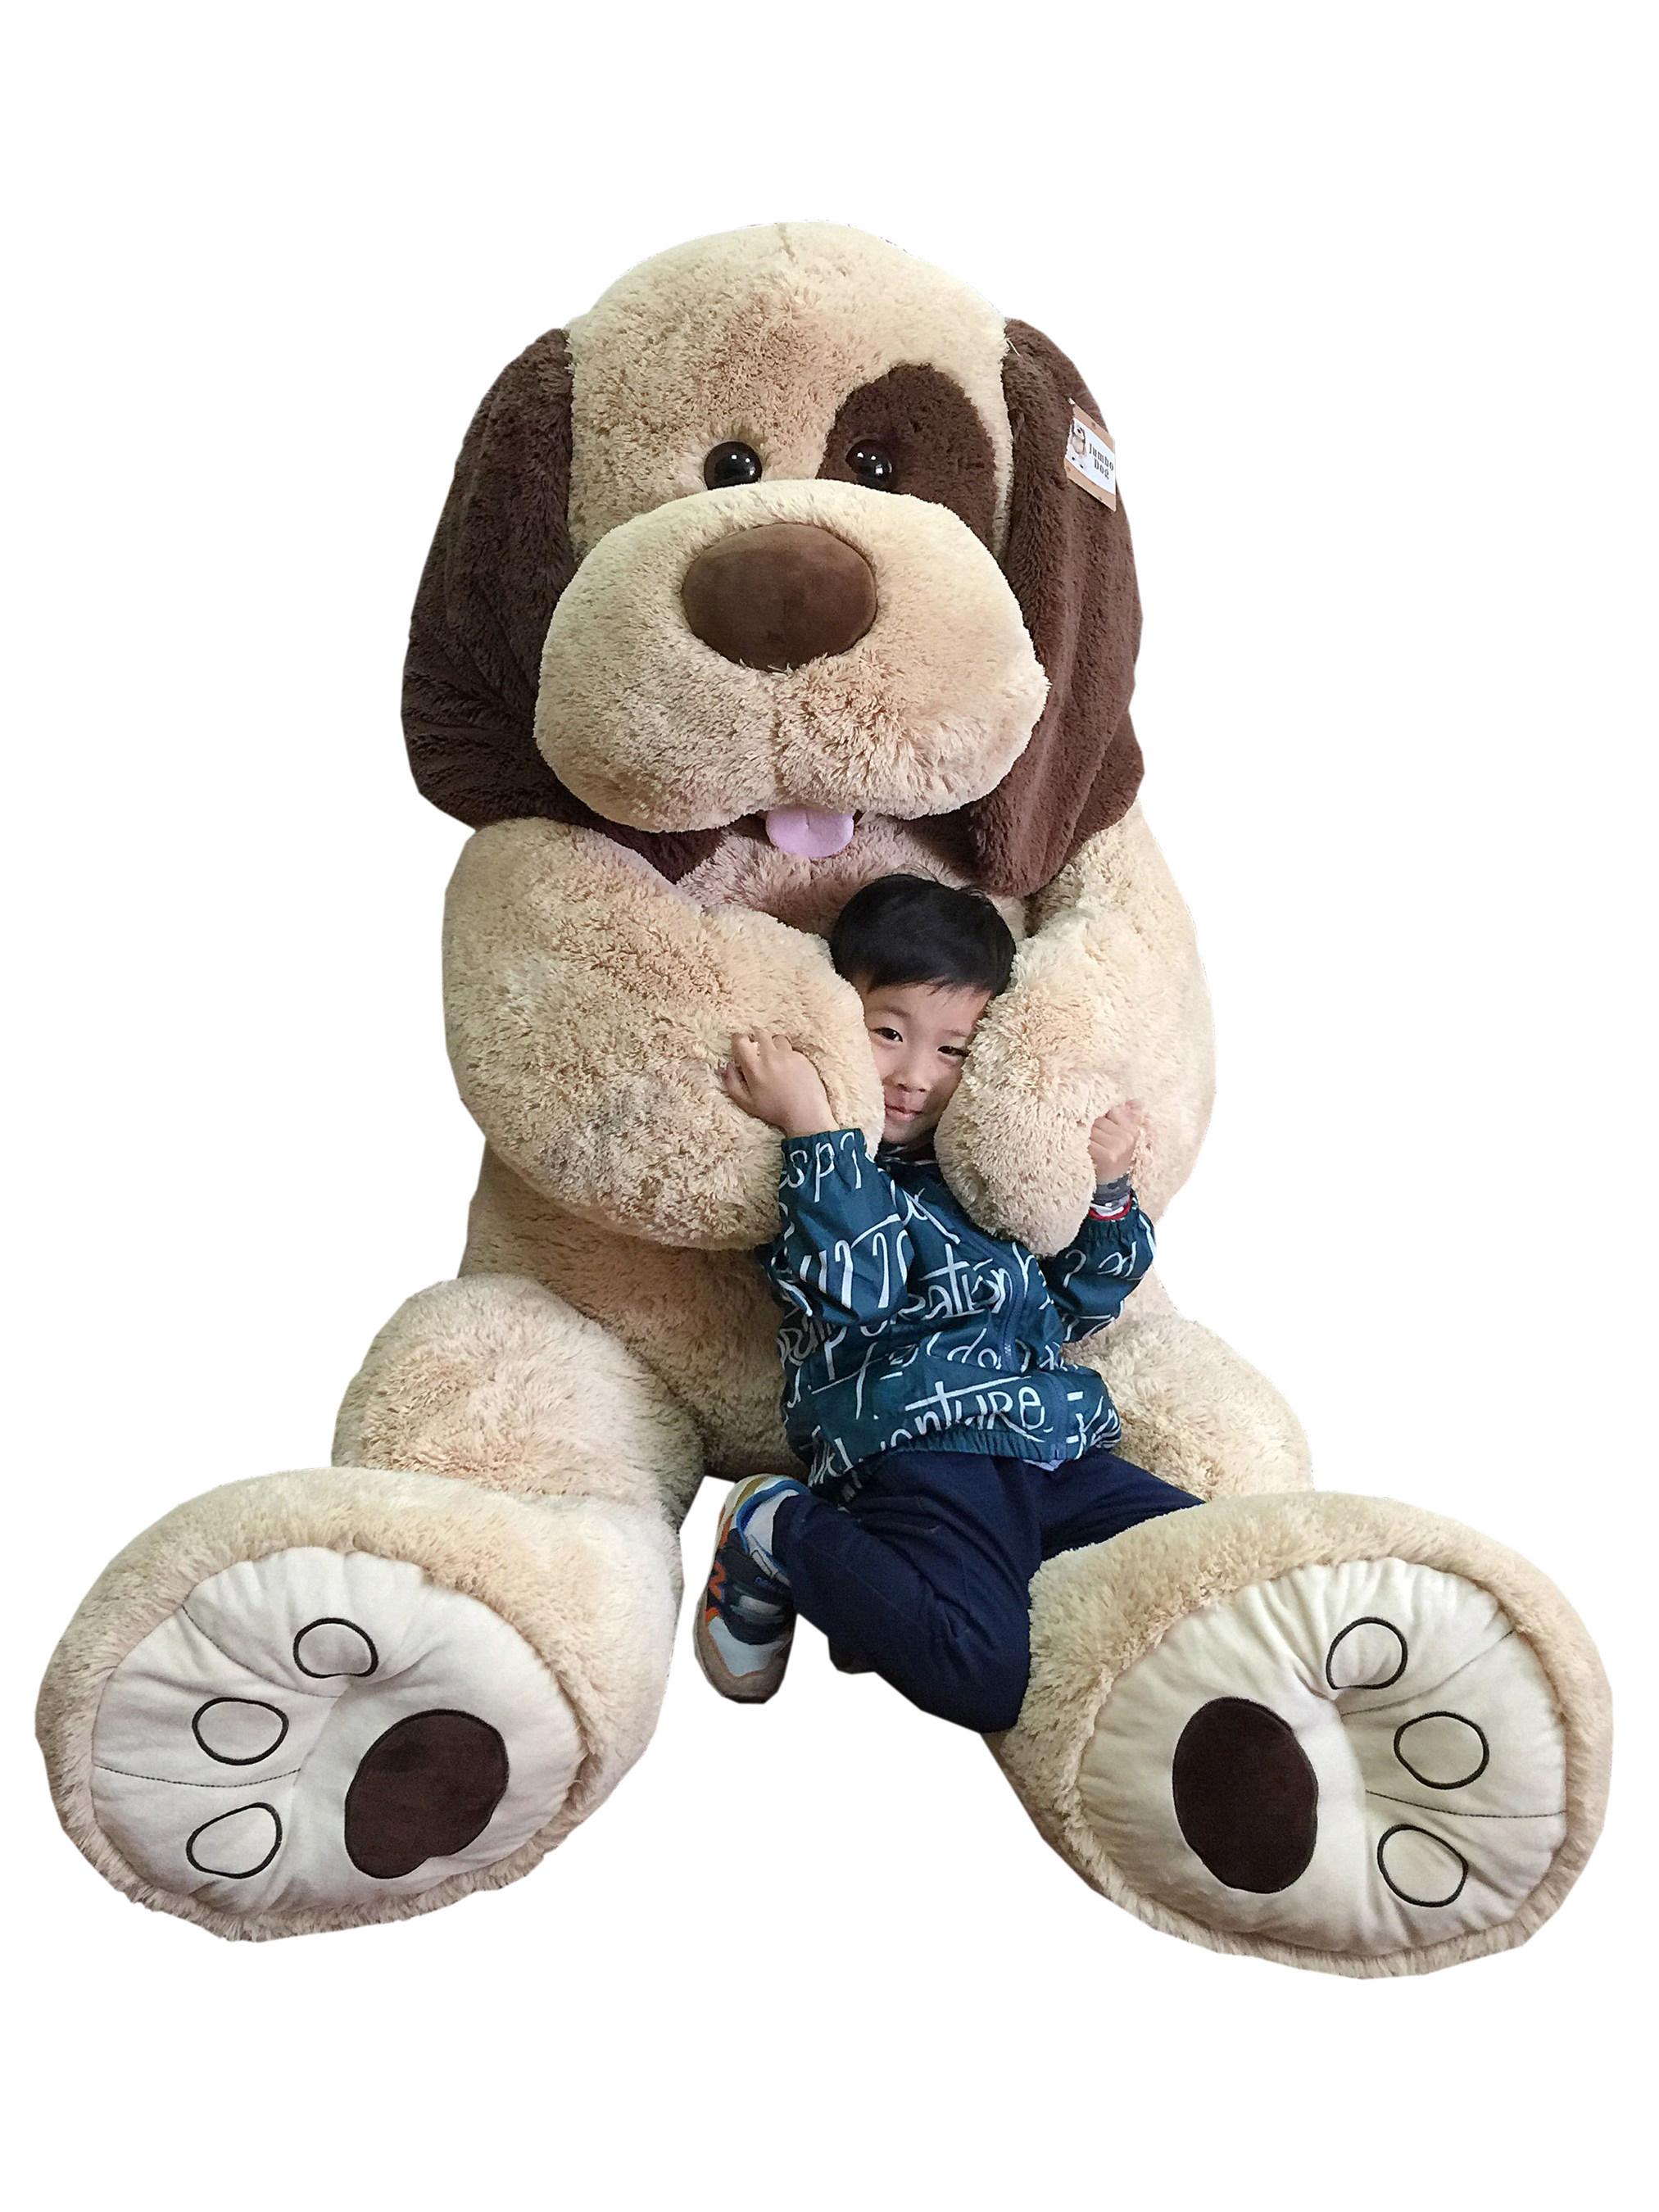 Jumbo Plush Dog, available at BJ's Clubs and BJs.com